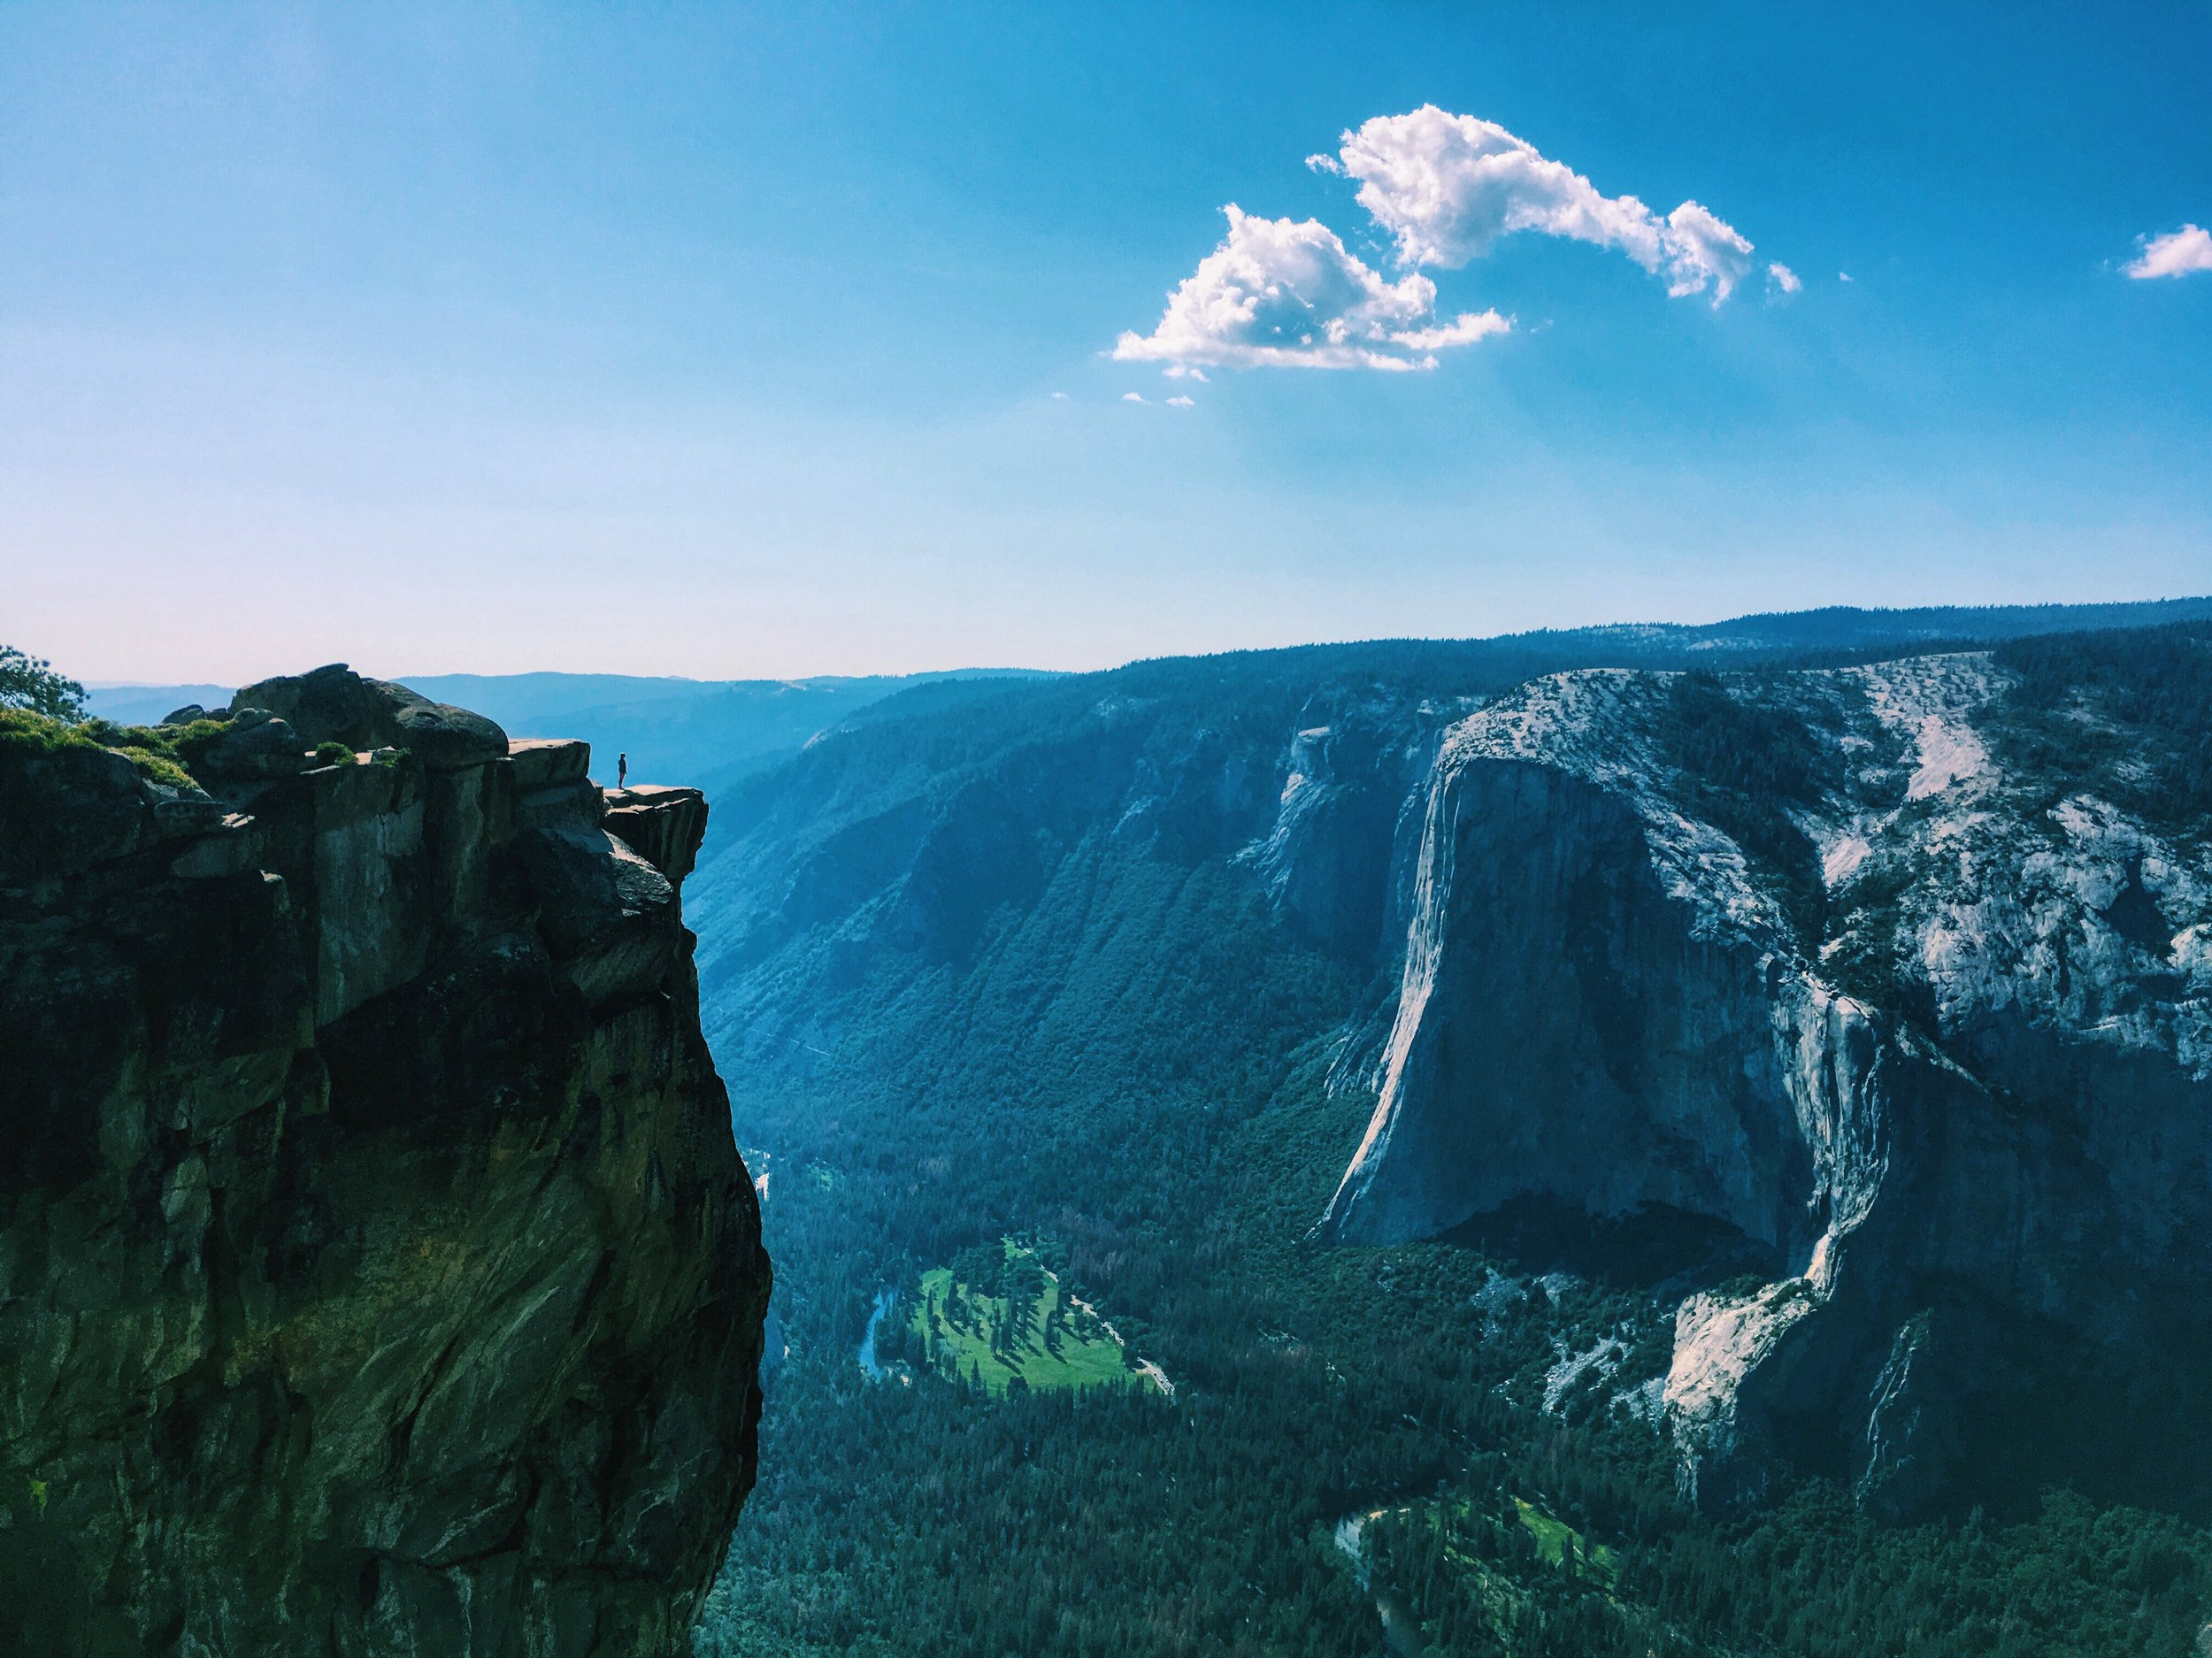 Run your way through Yosemite National Park